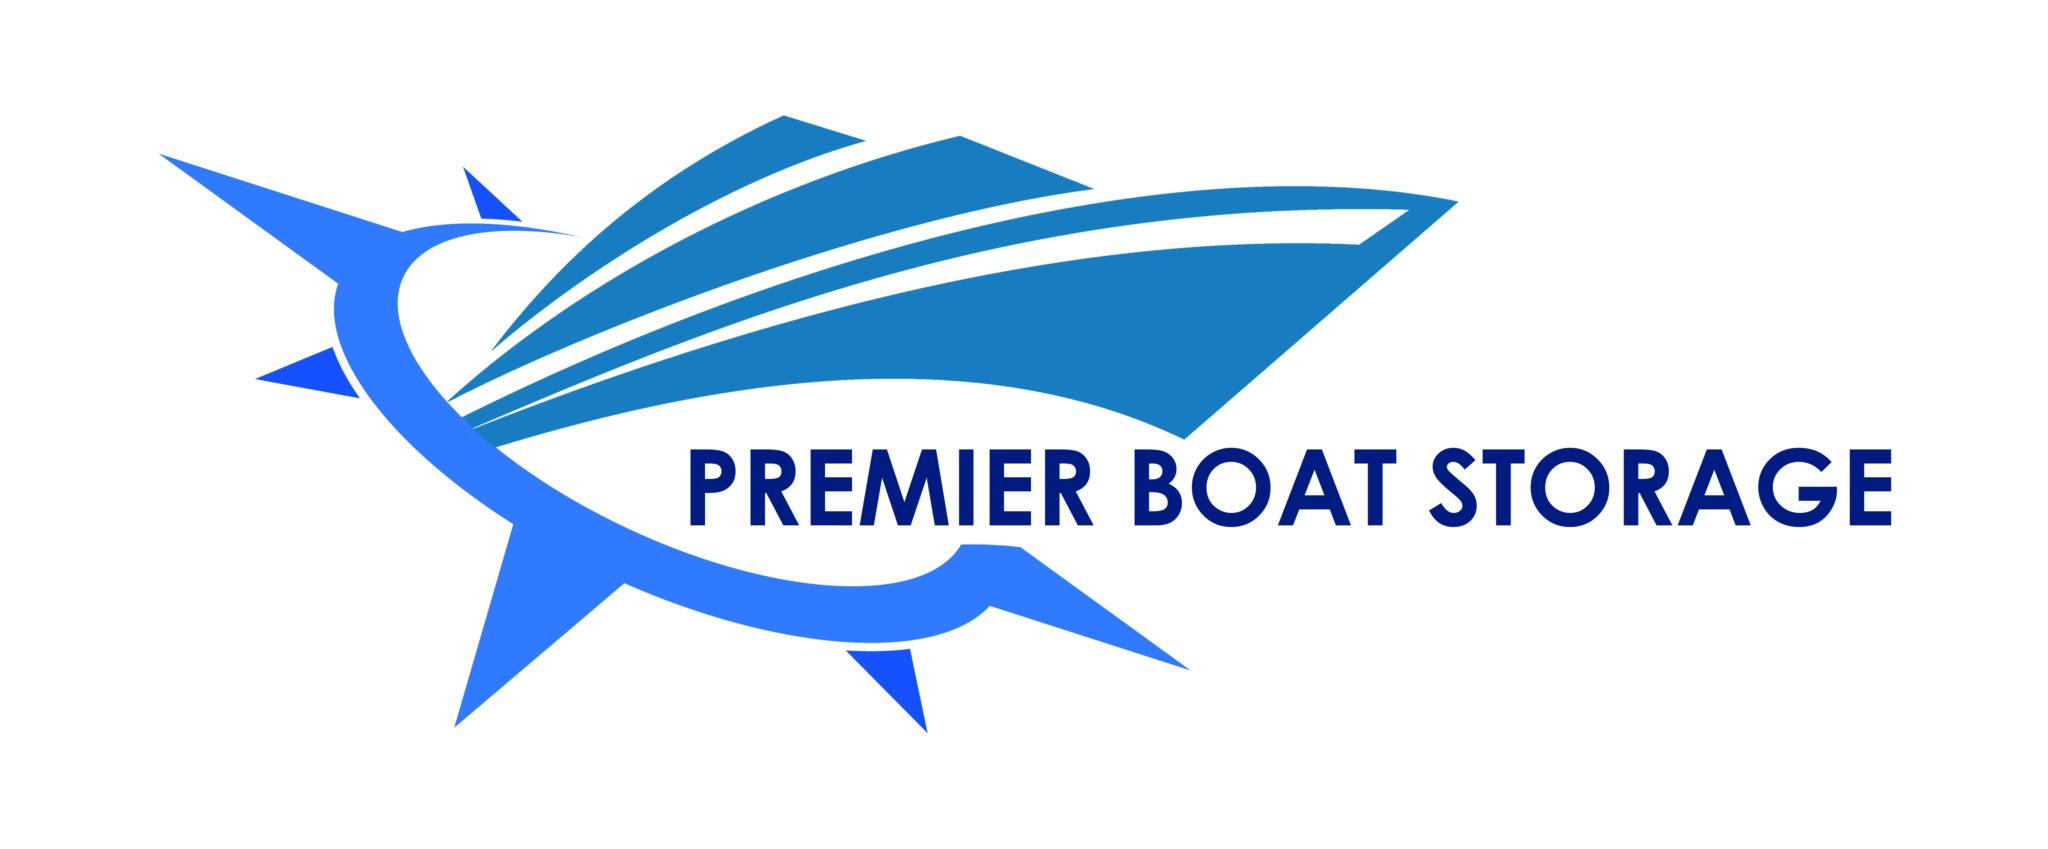 Premier Boat Storage